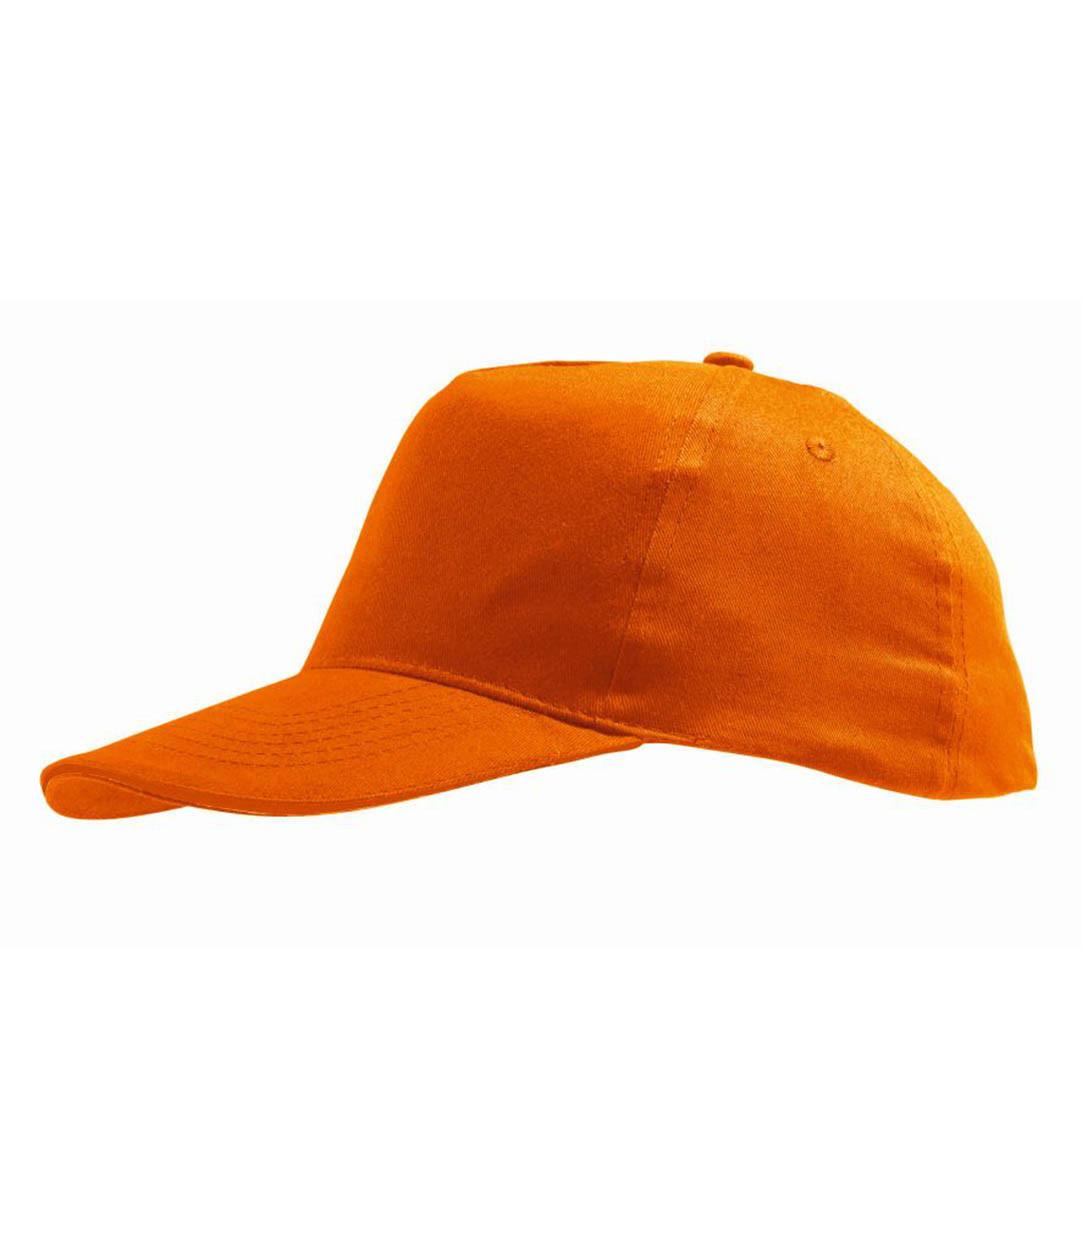 https://www.kwd.nl/media/catalog/product/o/r/oranje_cap_solly_sun.jpg